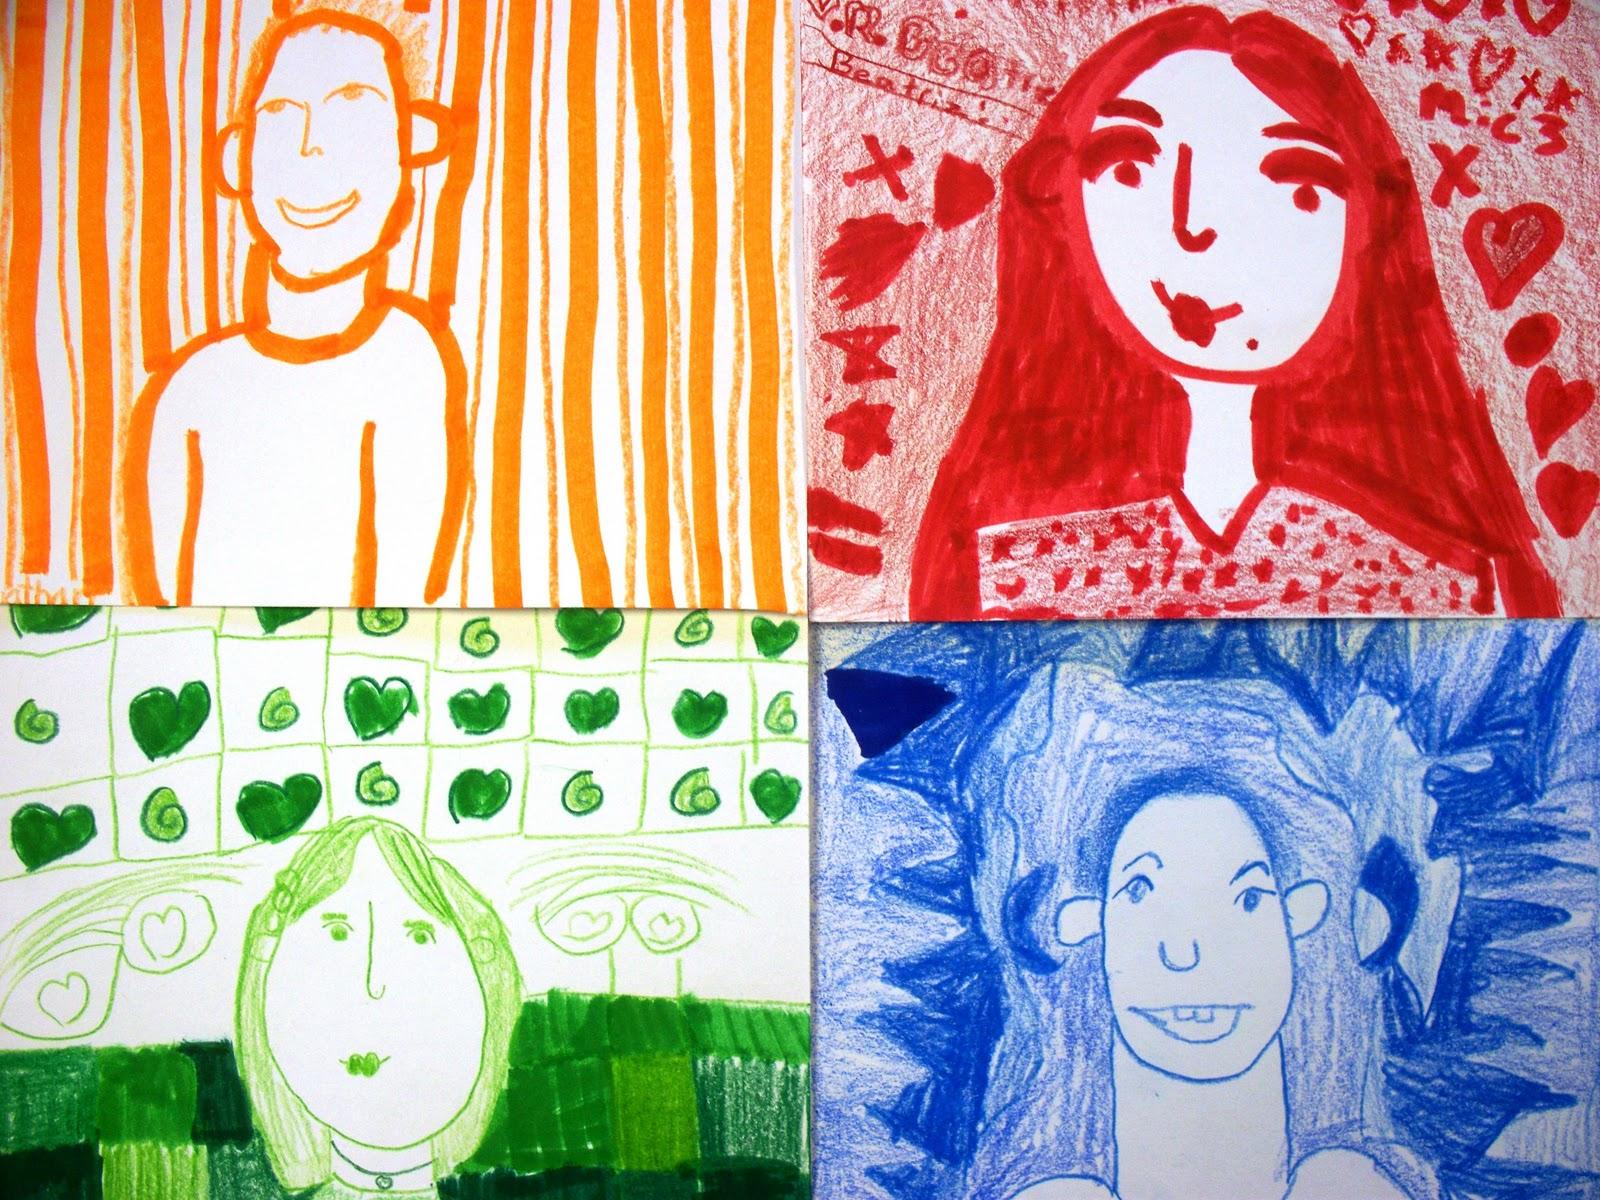 Creating Art: Monochromatic Self-Portraits